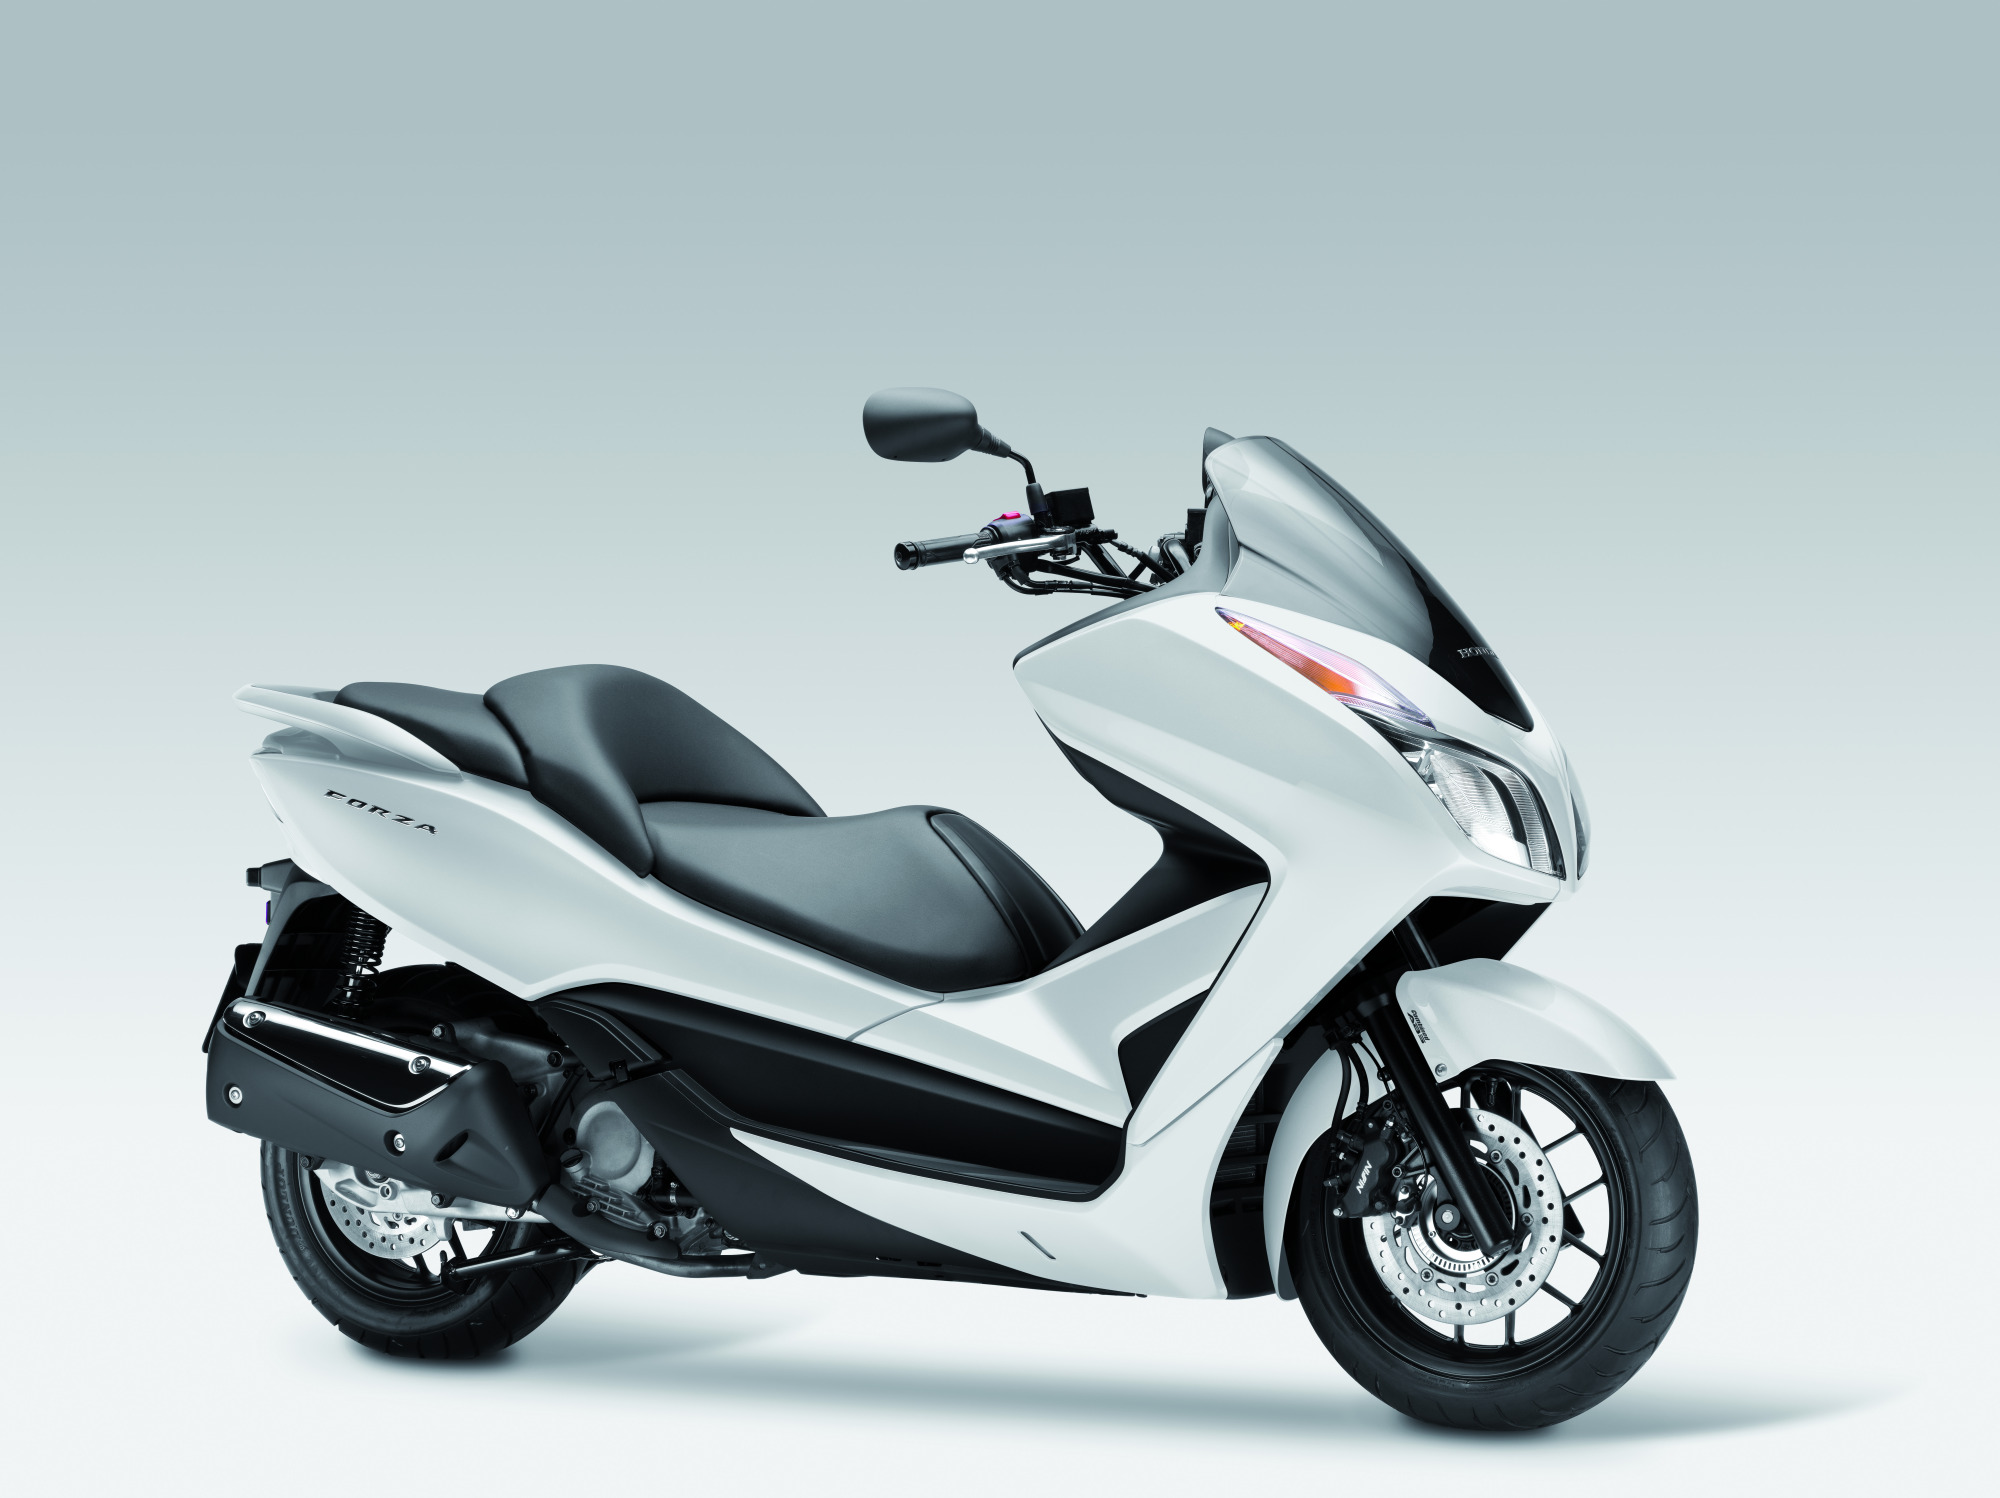 motorrad occasion honda nss 300 forza kaufen